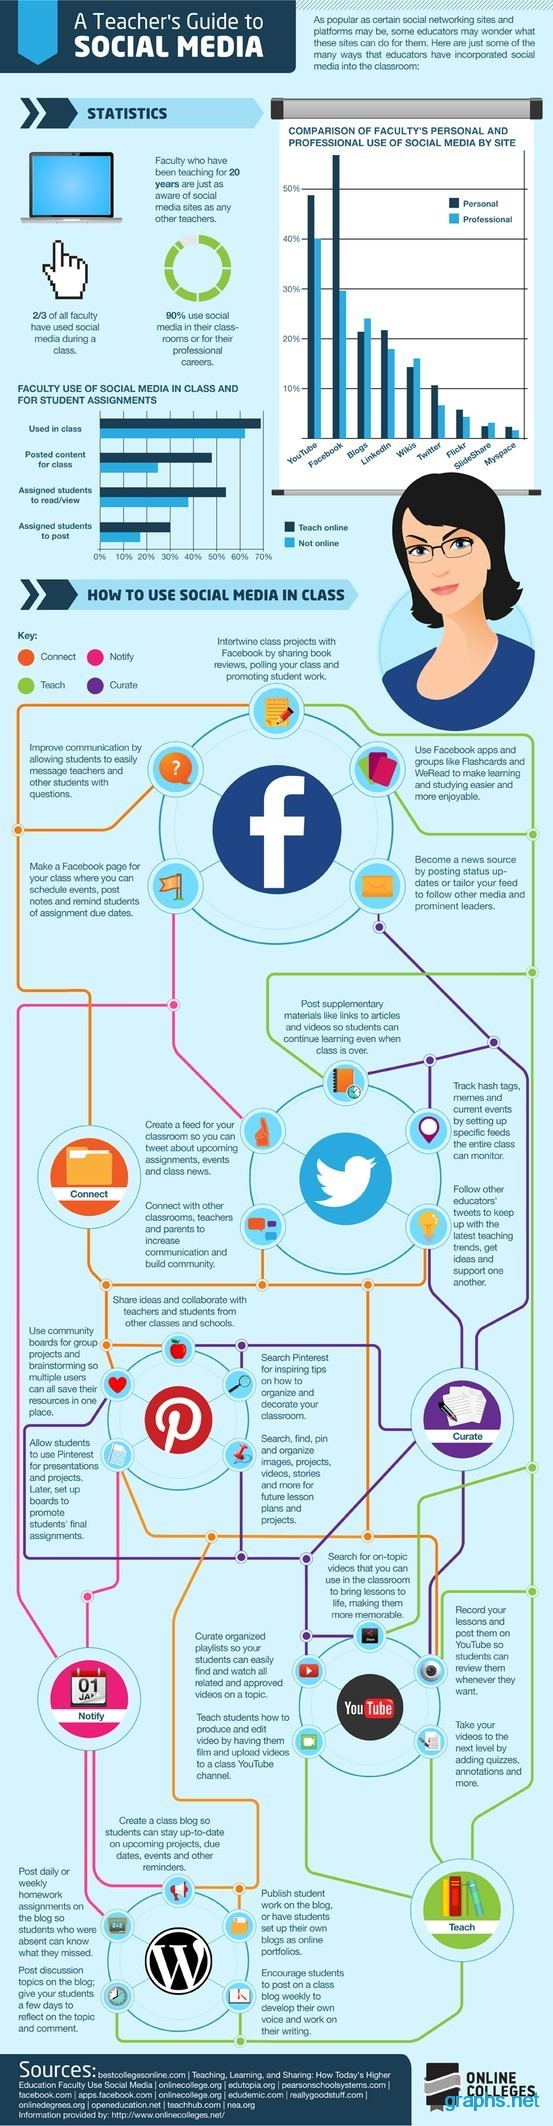 Using Social Media in Classrooms